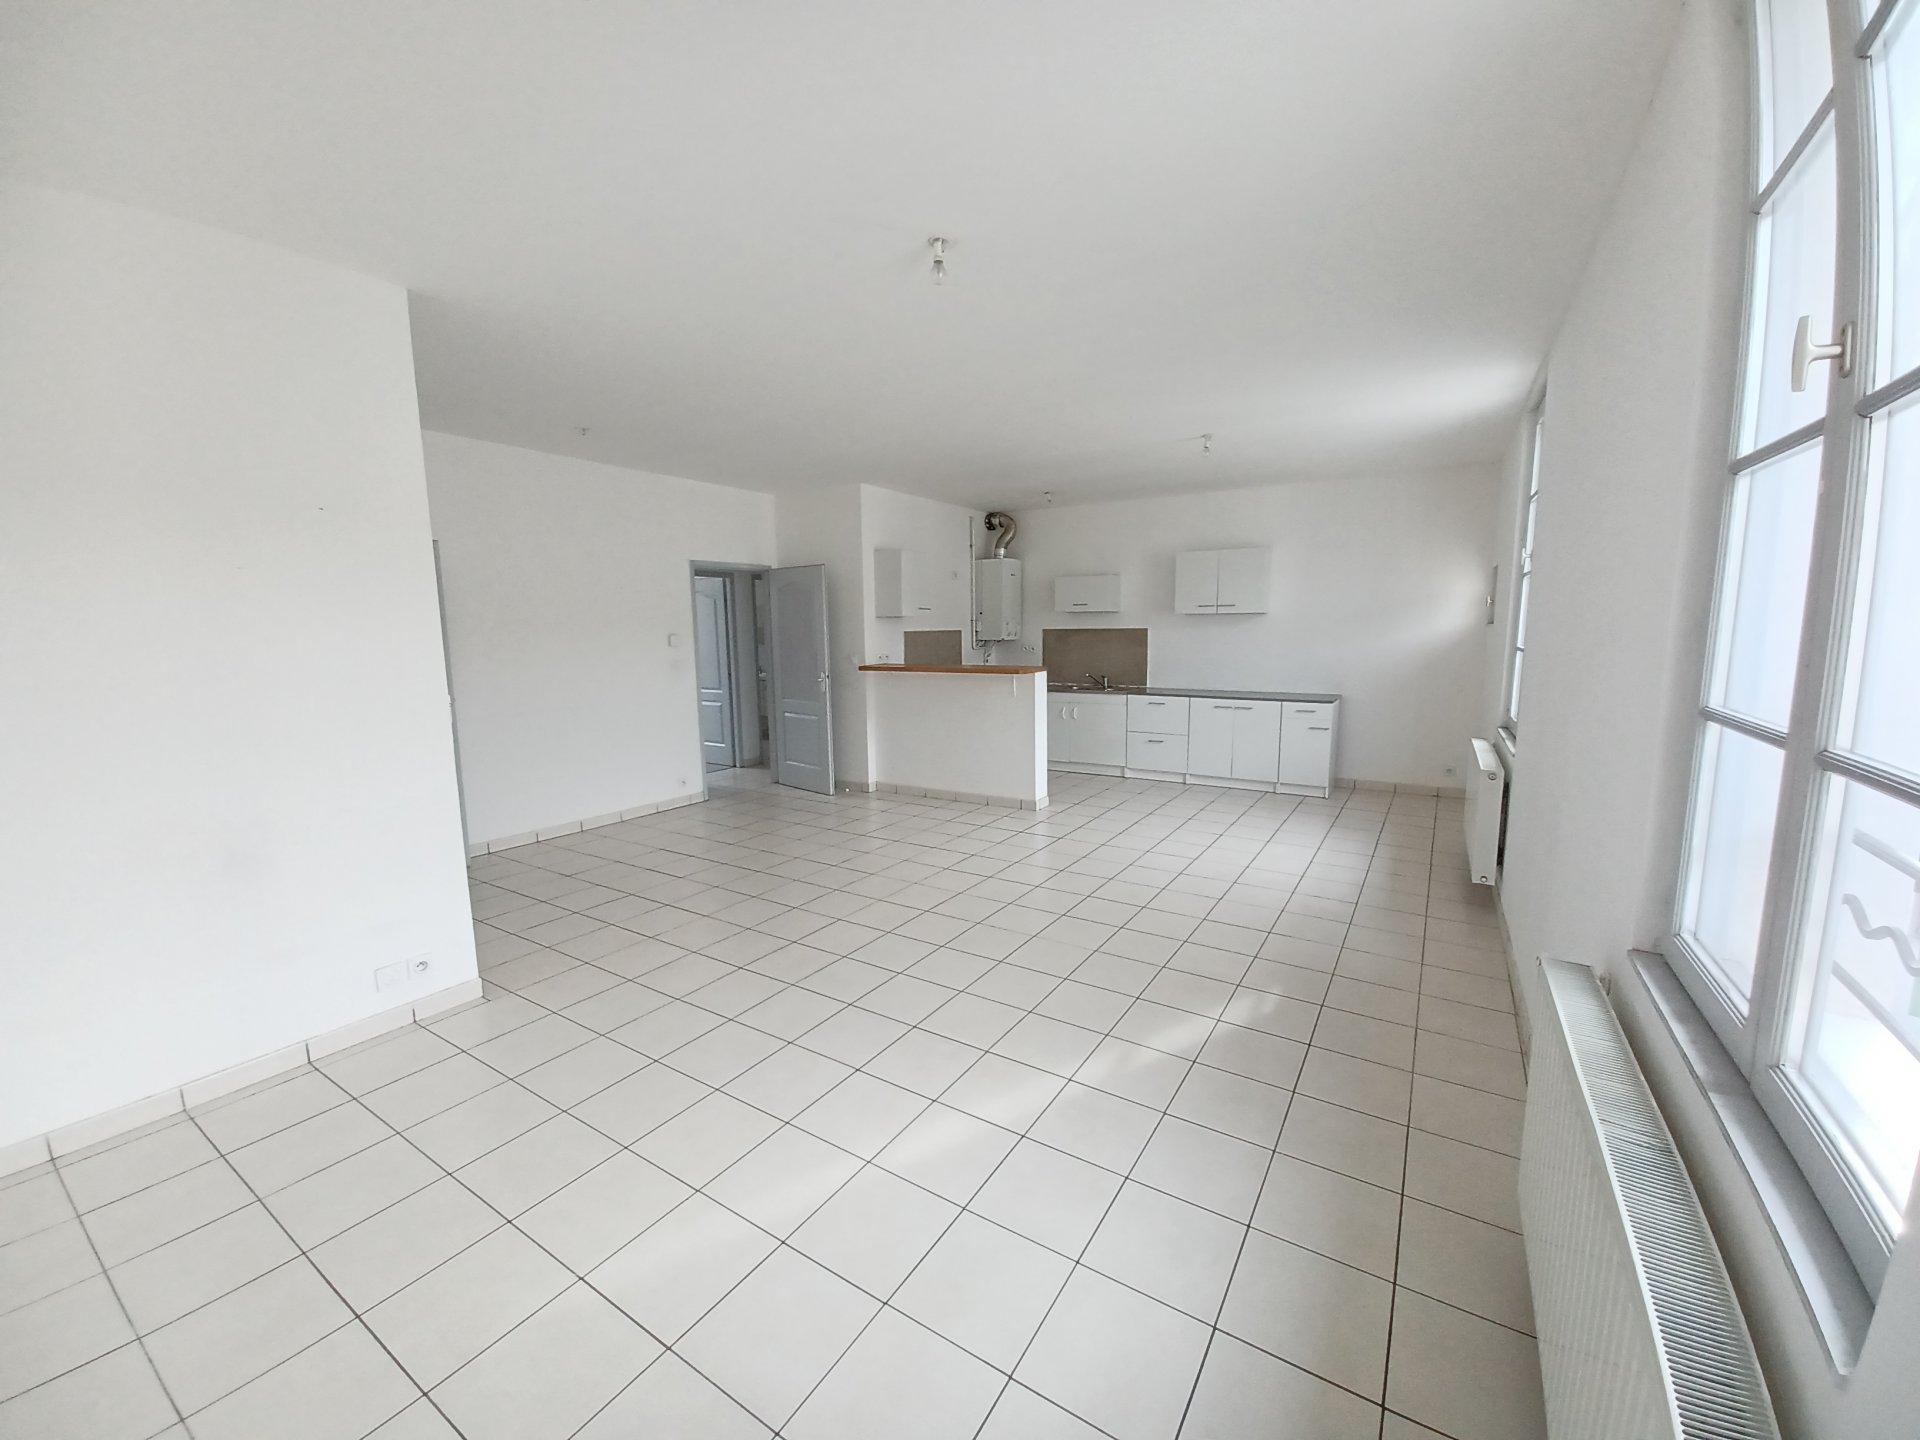 Location Appartement BEAUCAIRE Mandat : 0538